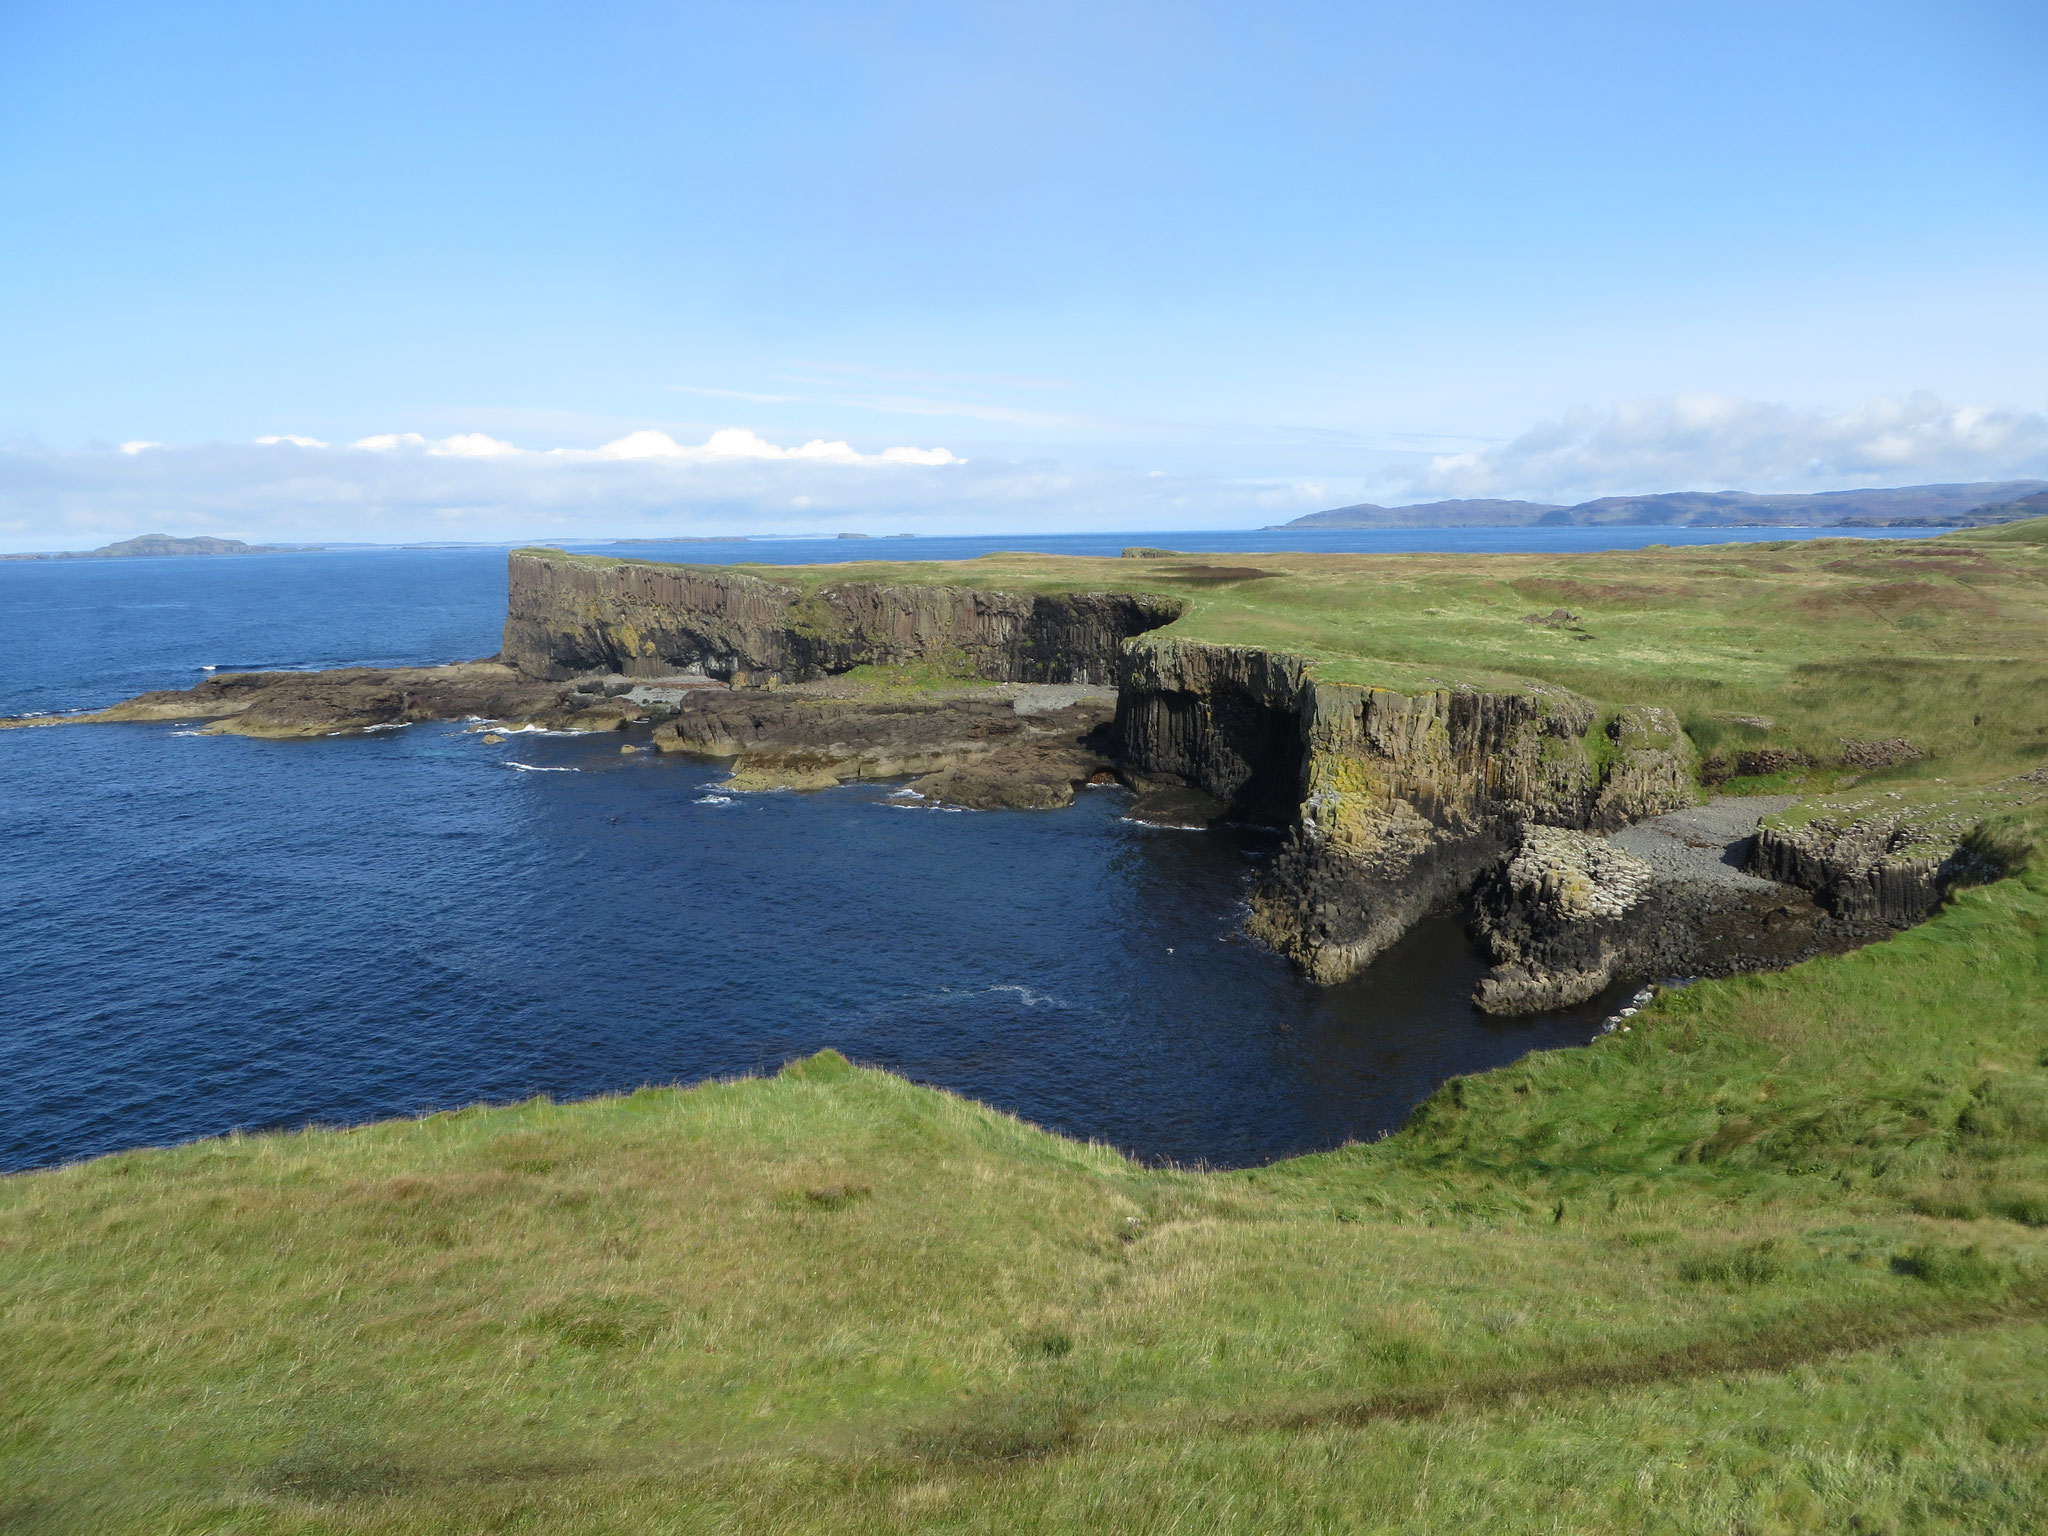 Auf Staffa Island